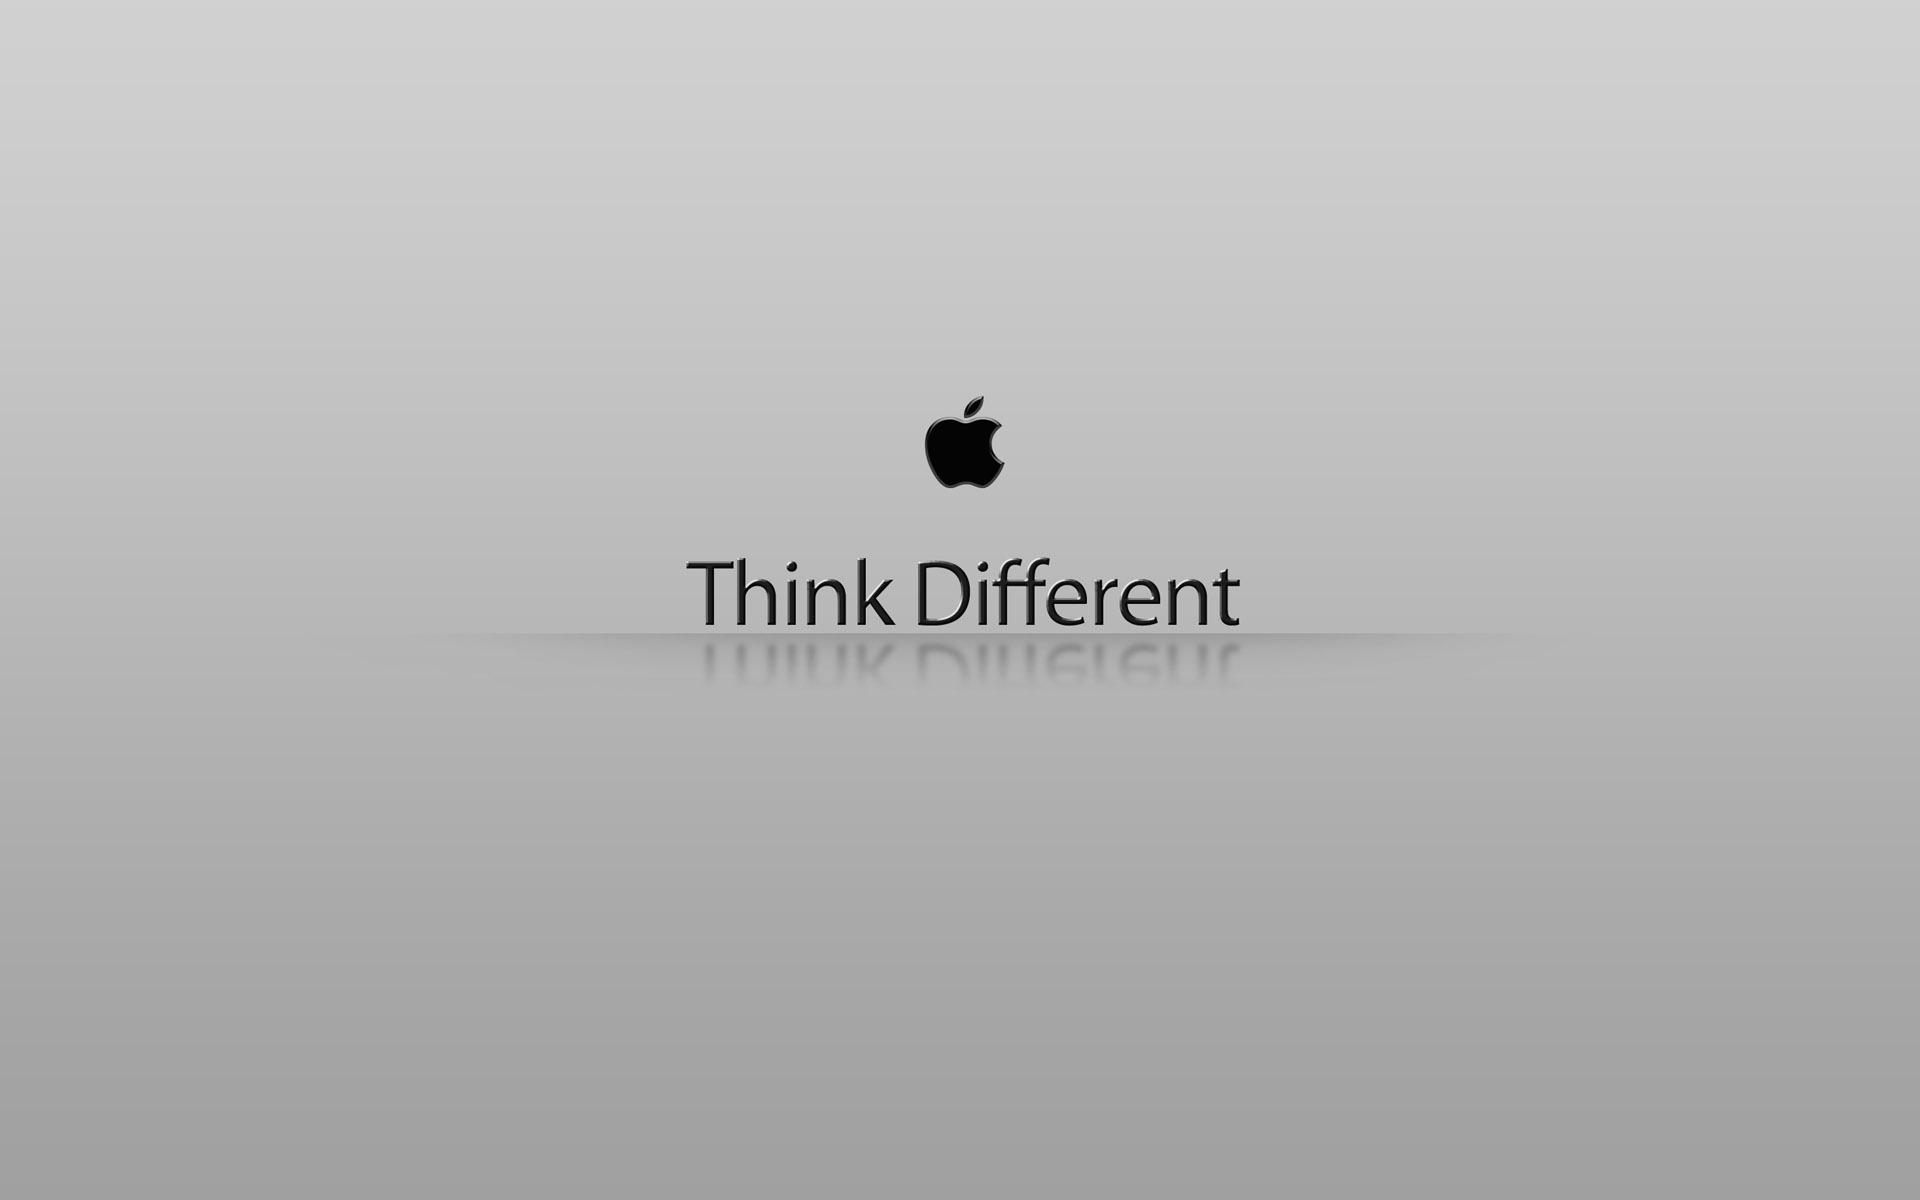 Apple Desktop Wallpaper High Resolution